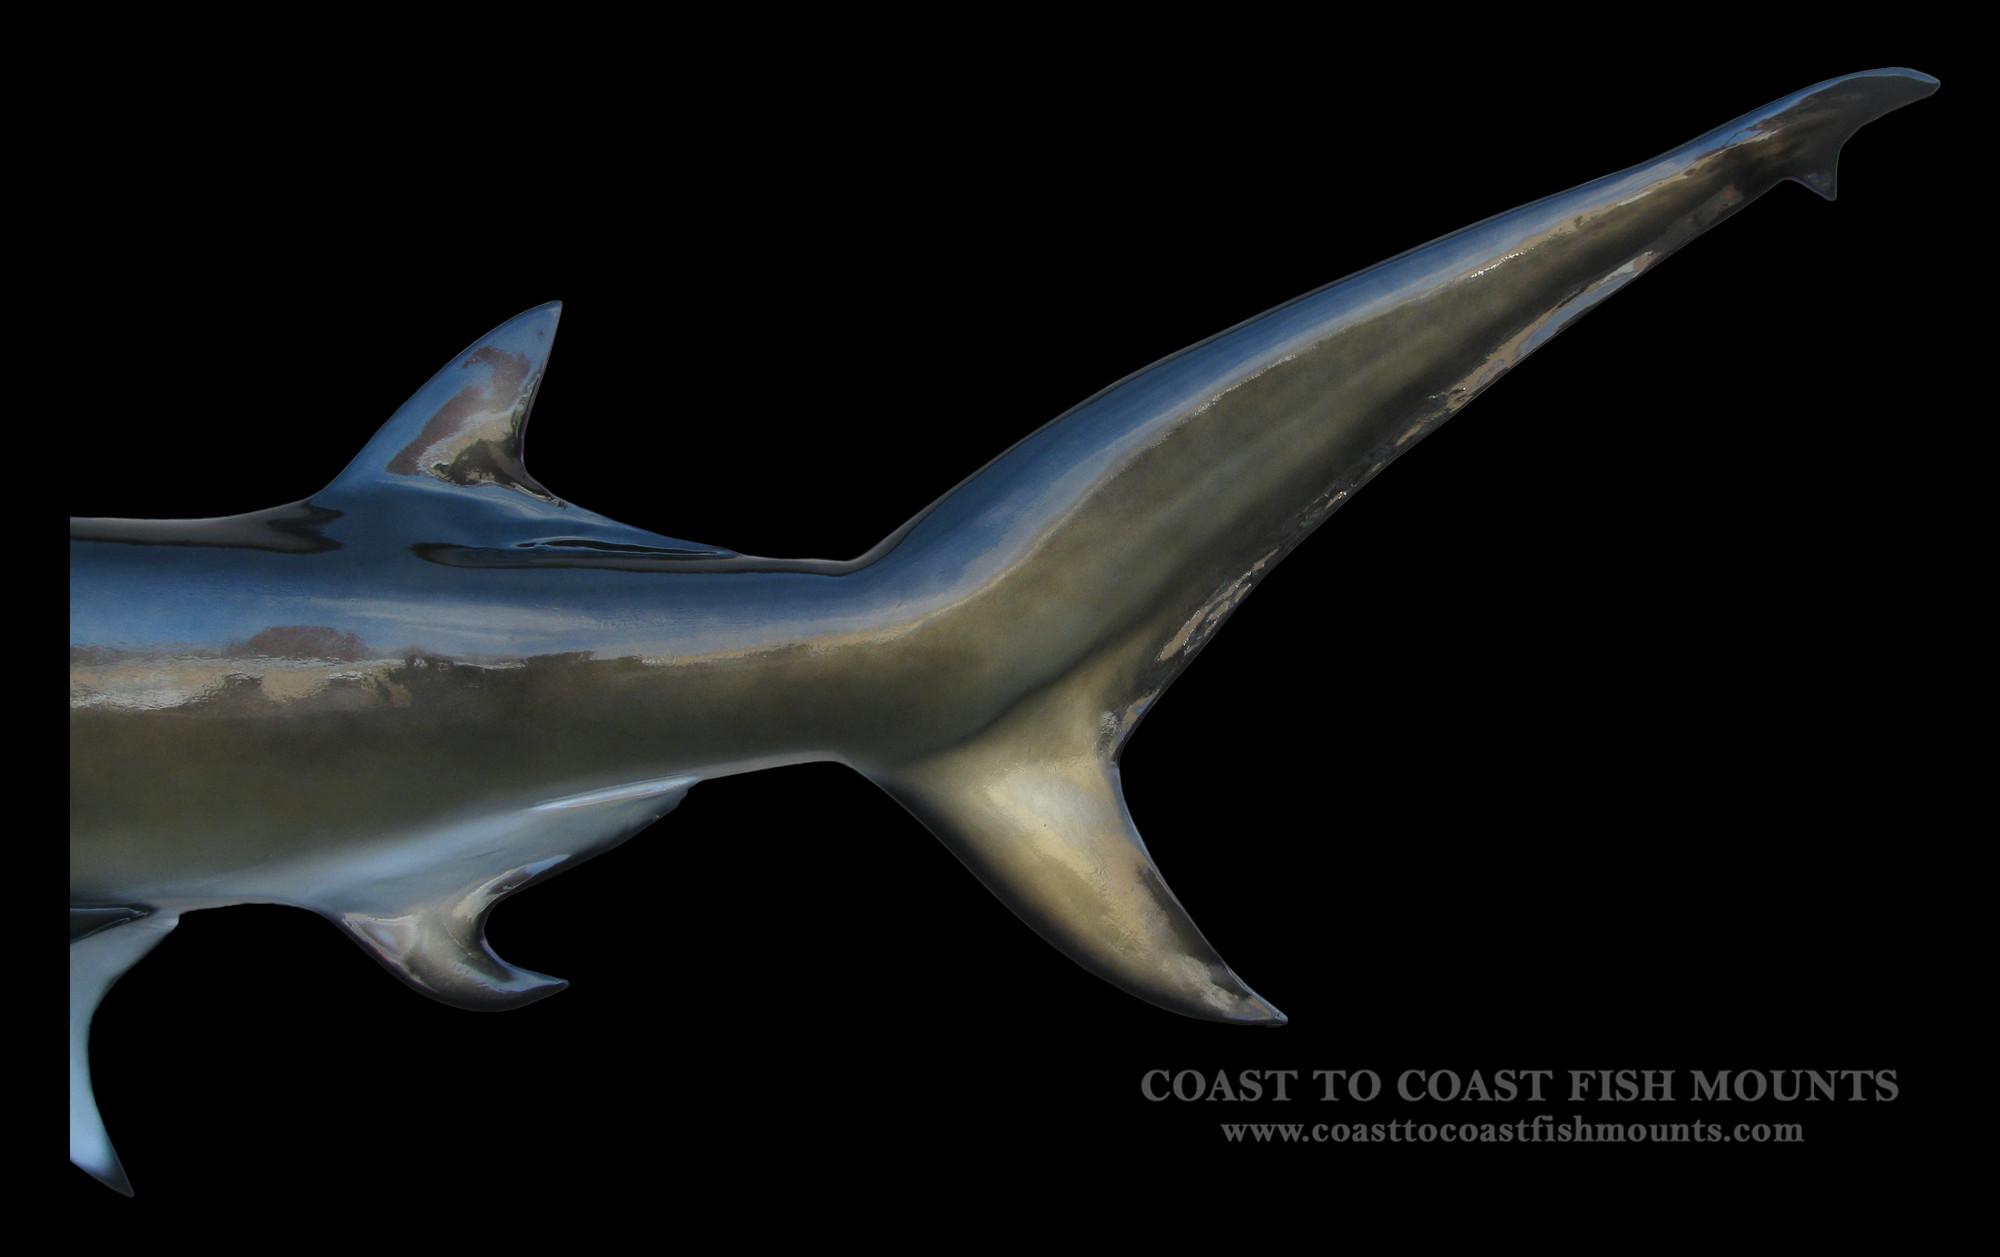 hammerhead shark fish mount and fish replicas coast to coast